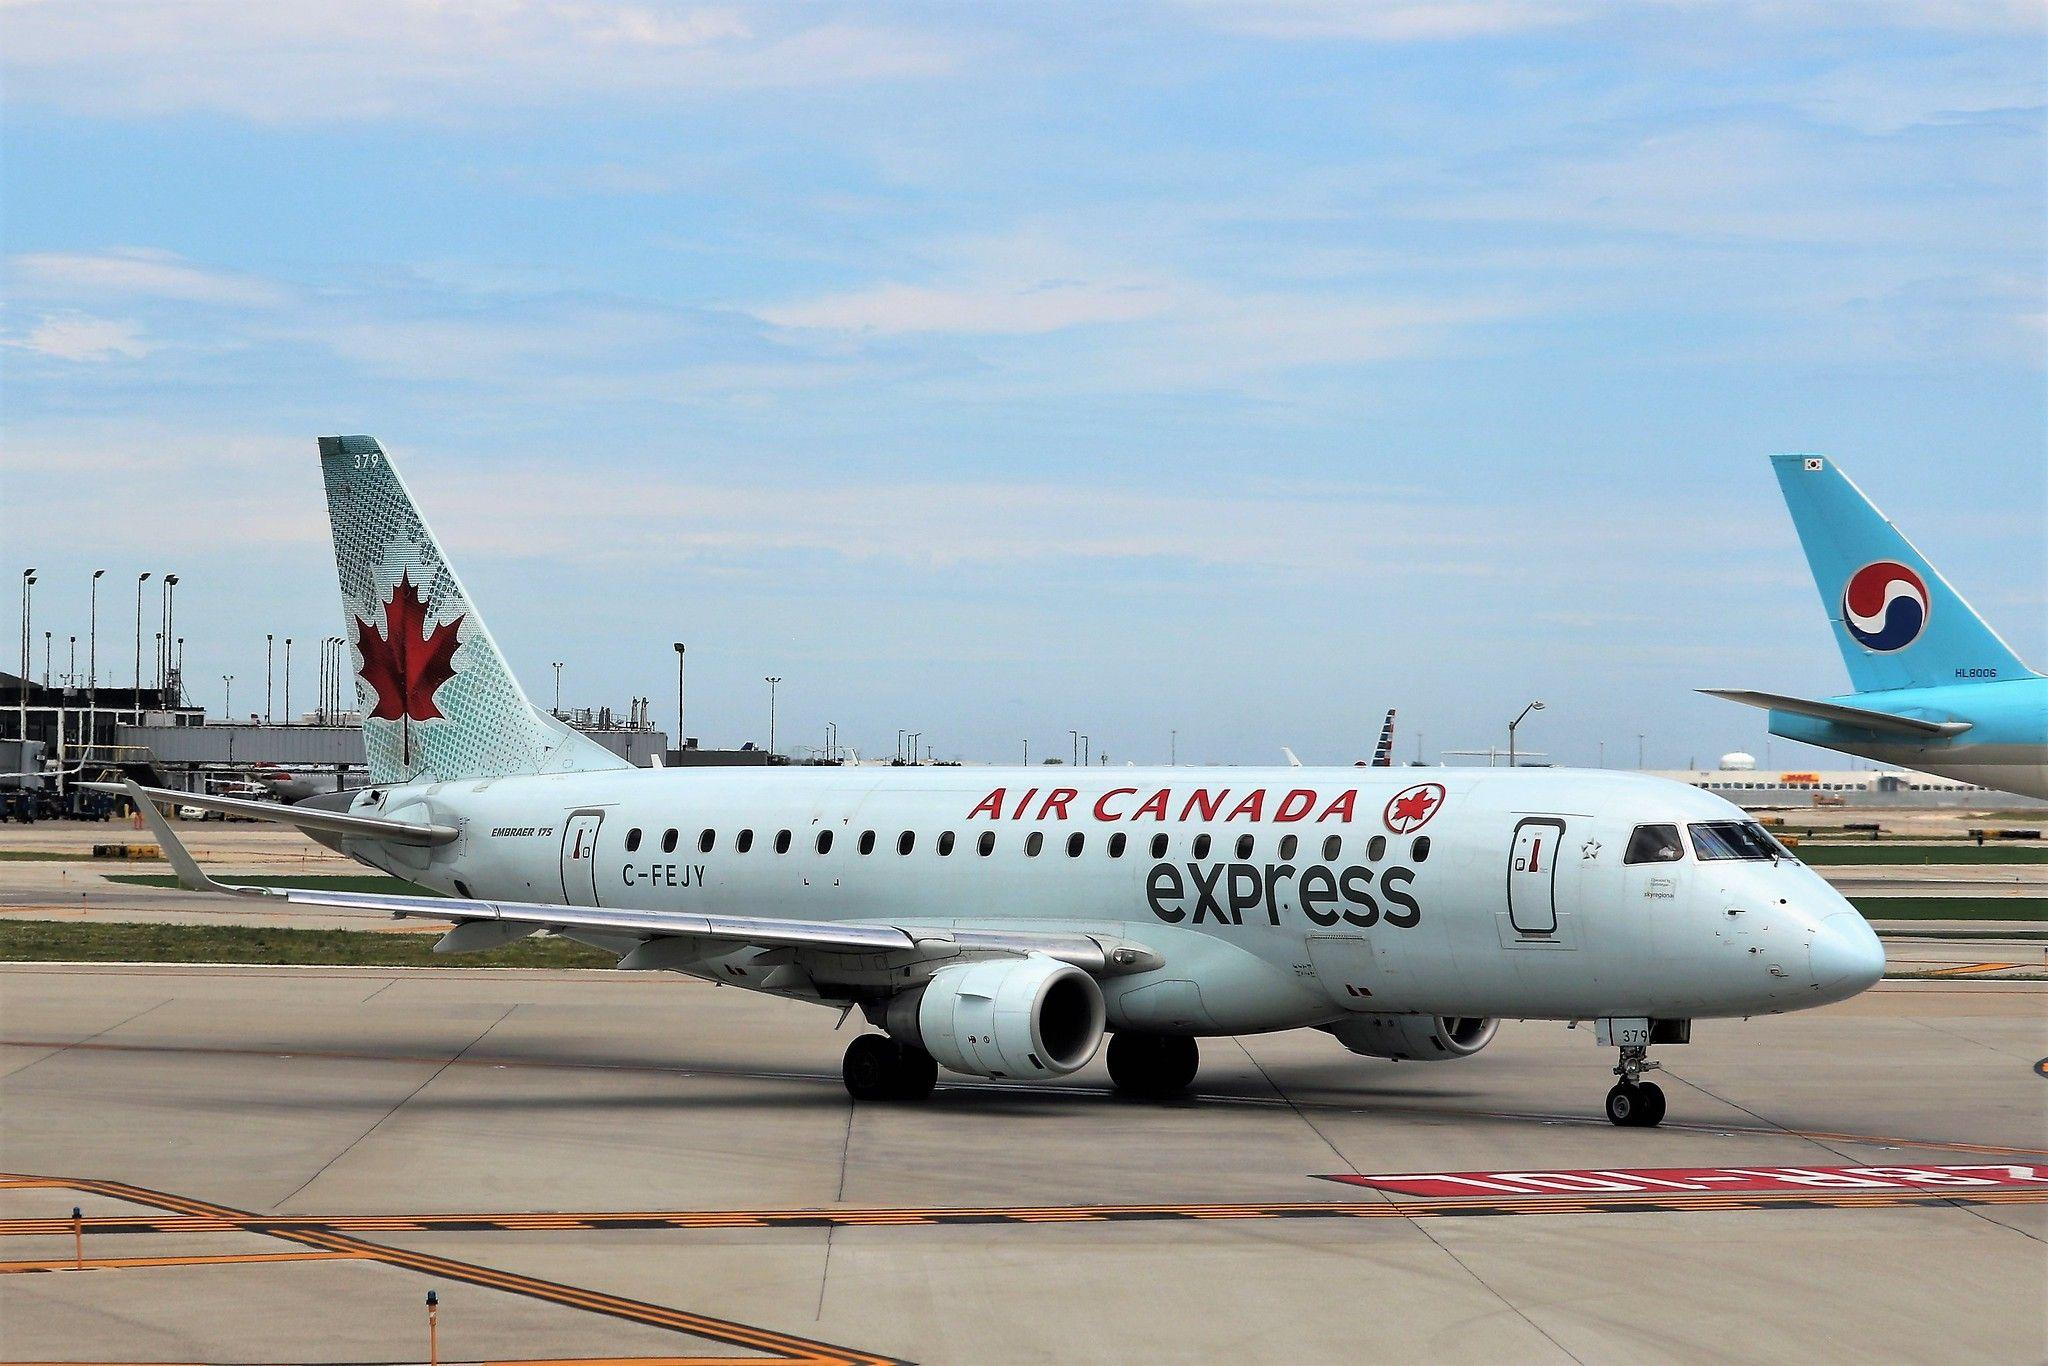 Air Canada Express ERJ175 Canada